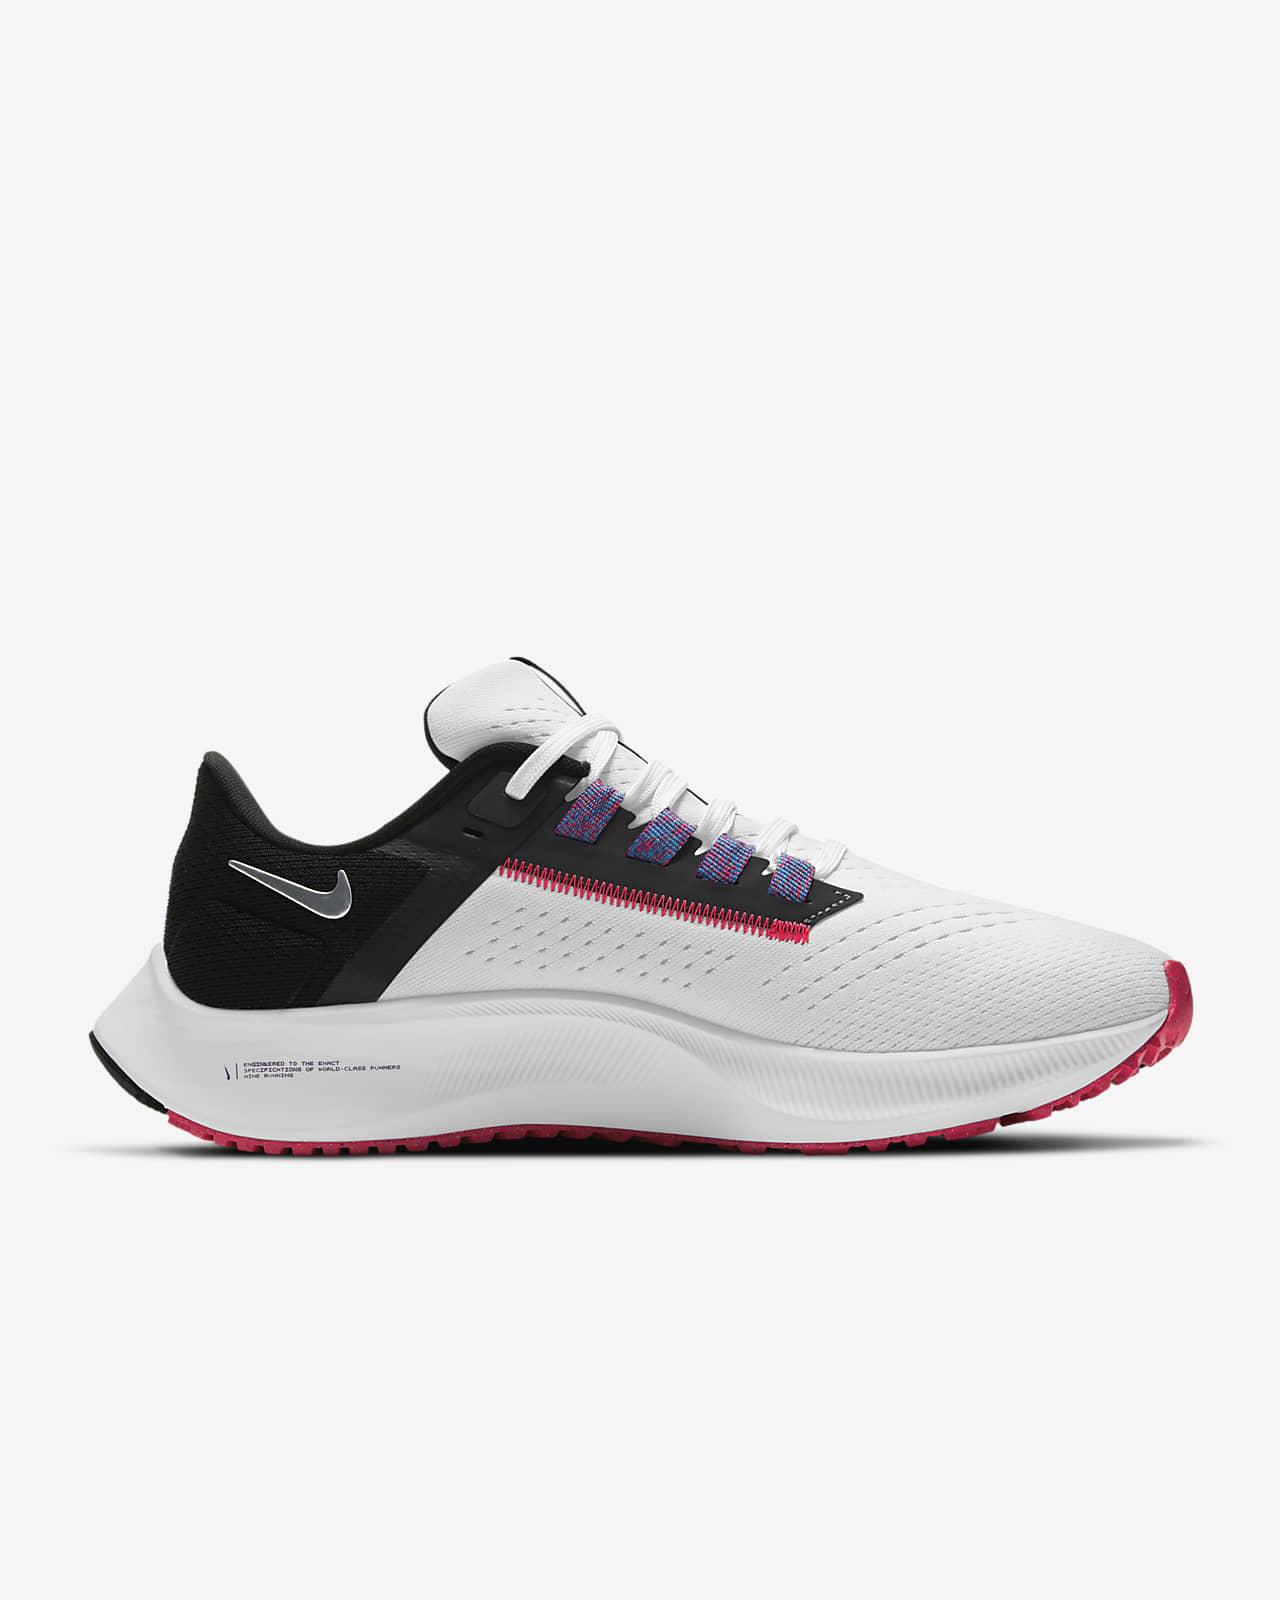 Nike Air Zoom Pegasus 38 Women's Running Shoes. Nike LU